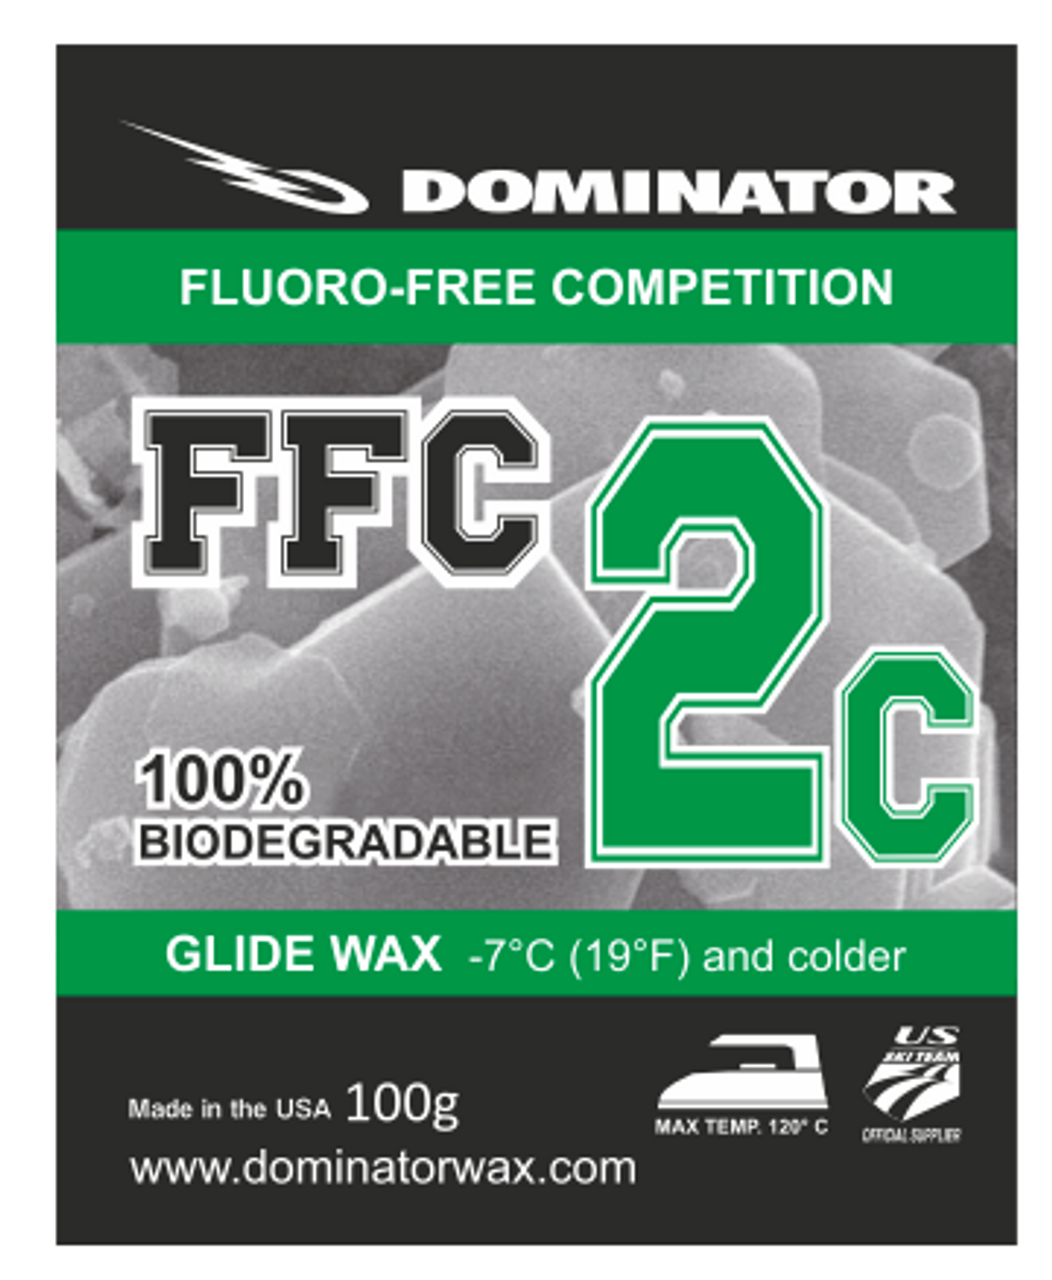 Dominator FFC2 Wax